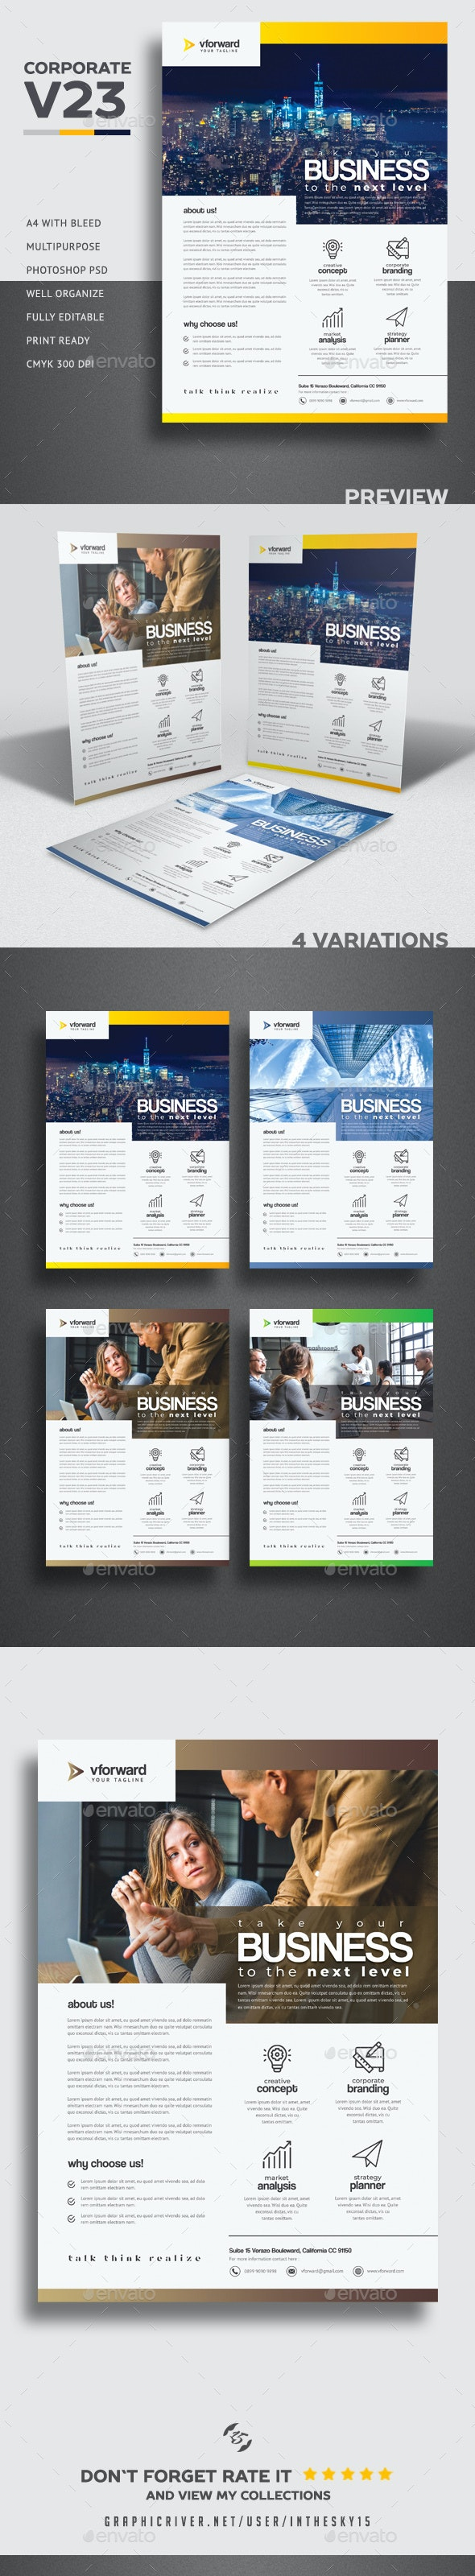 Corporate V23 Flyer - Corporate Brochures